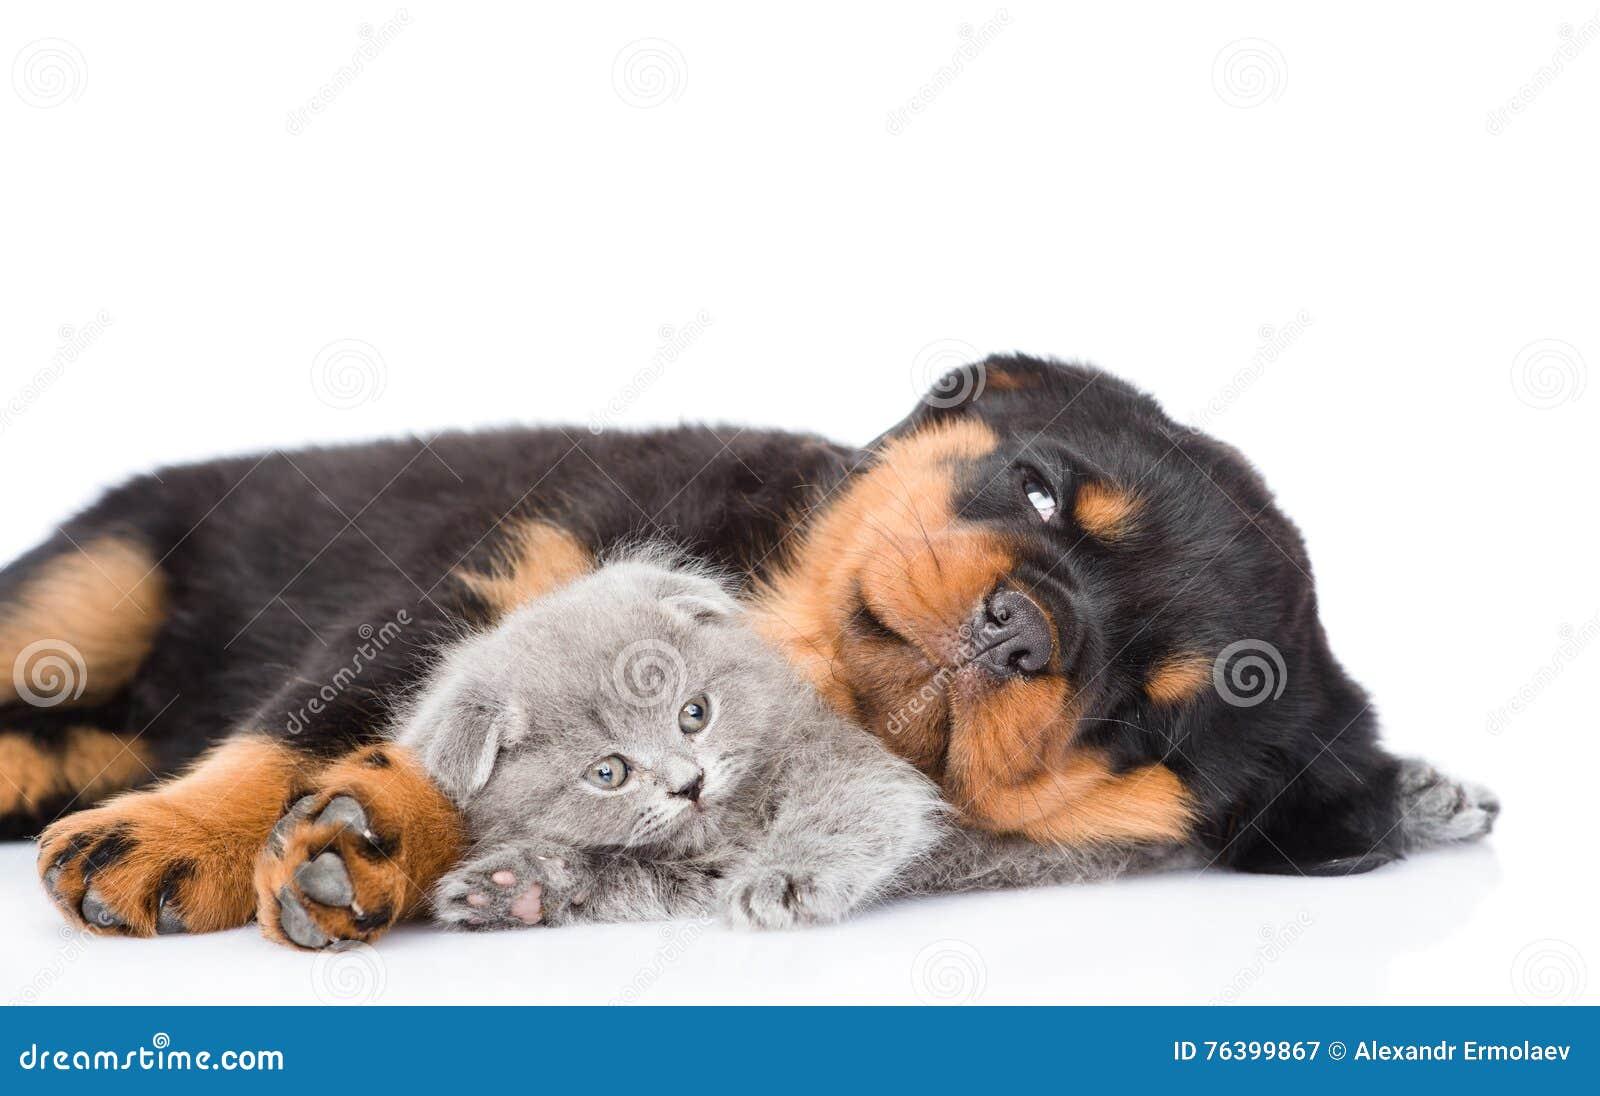 Sleeping Rottweiler Puppy Hugging Newborn Kitten Isolated